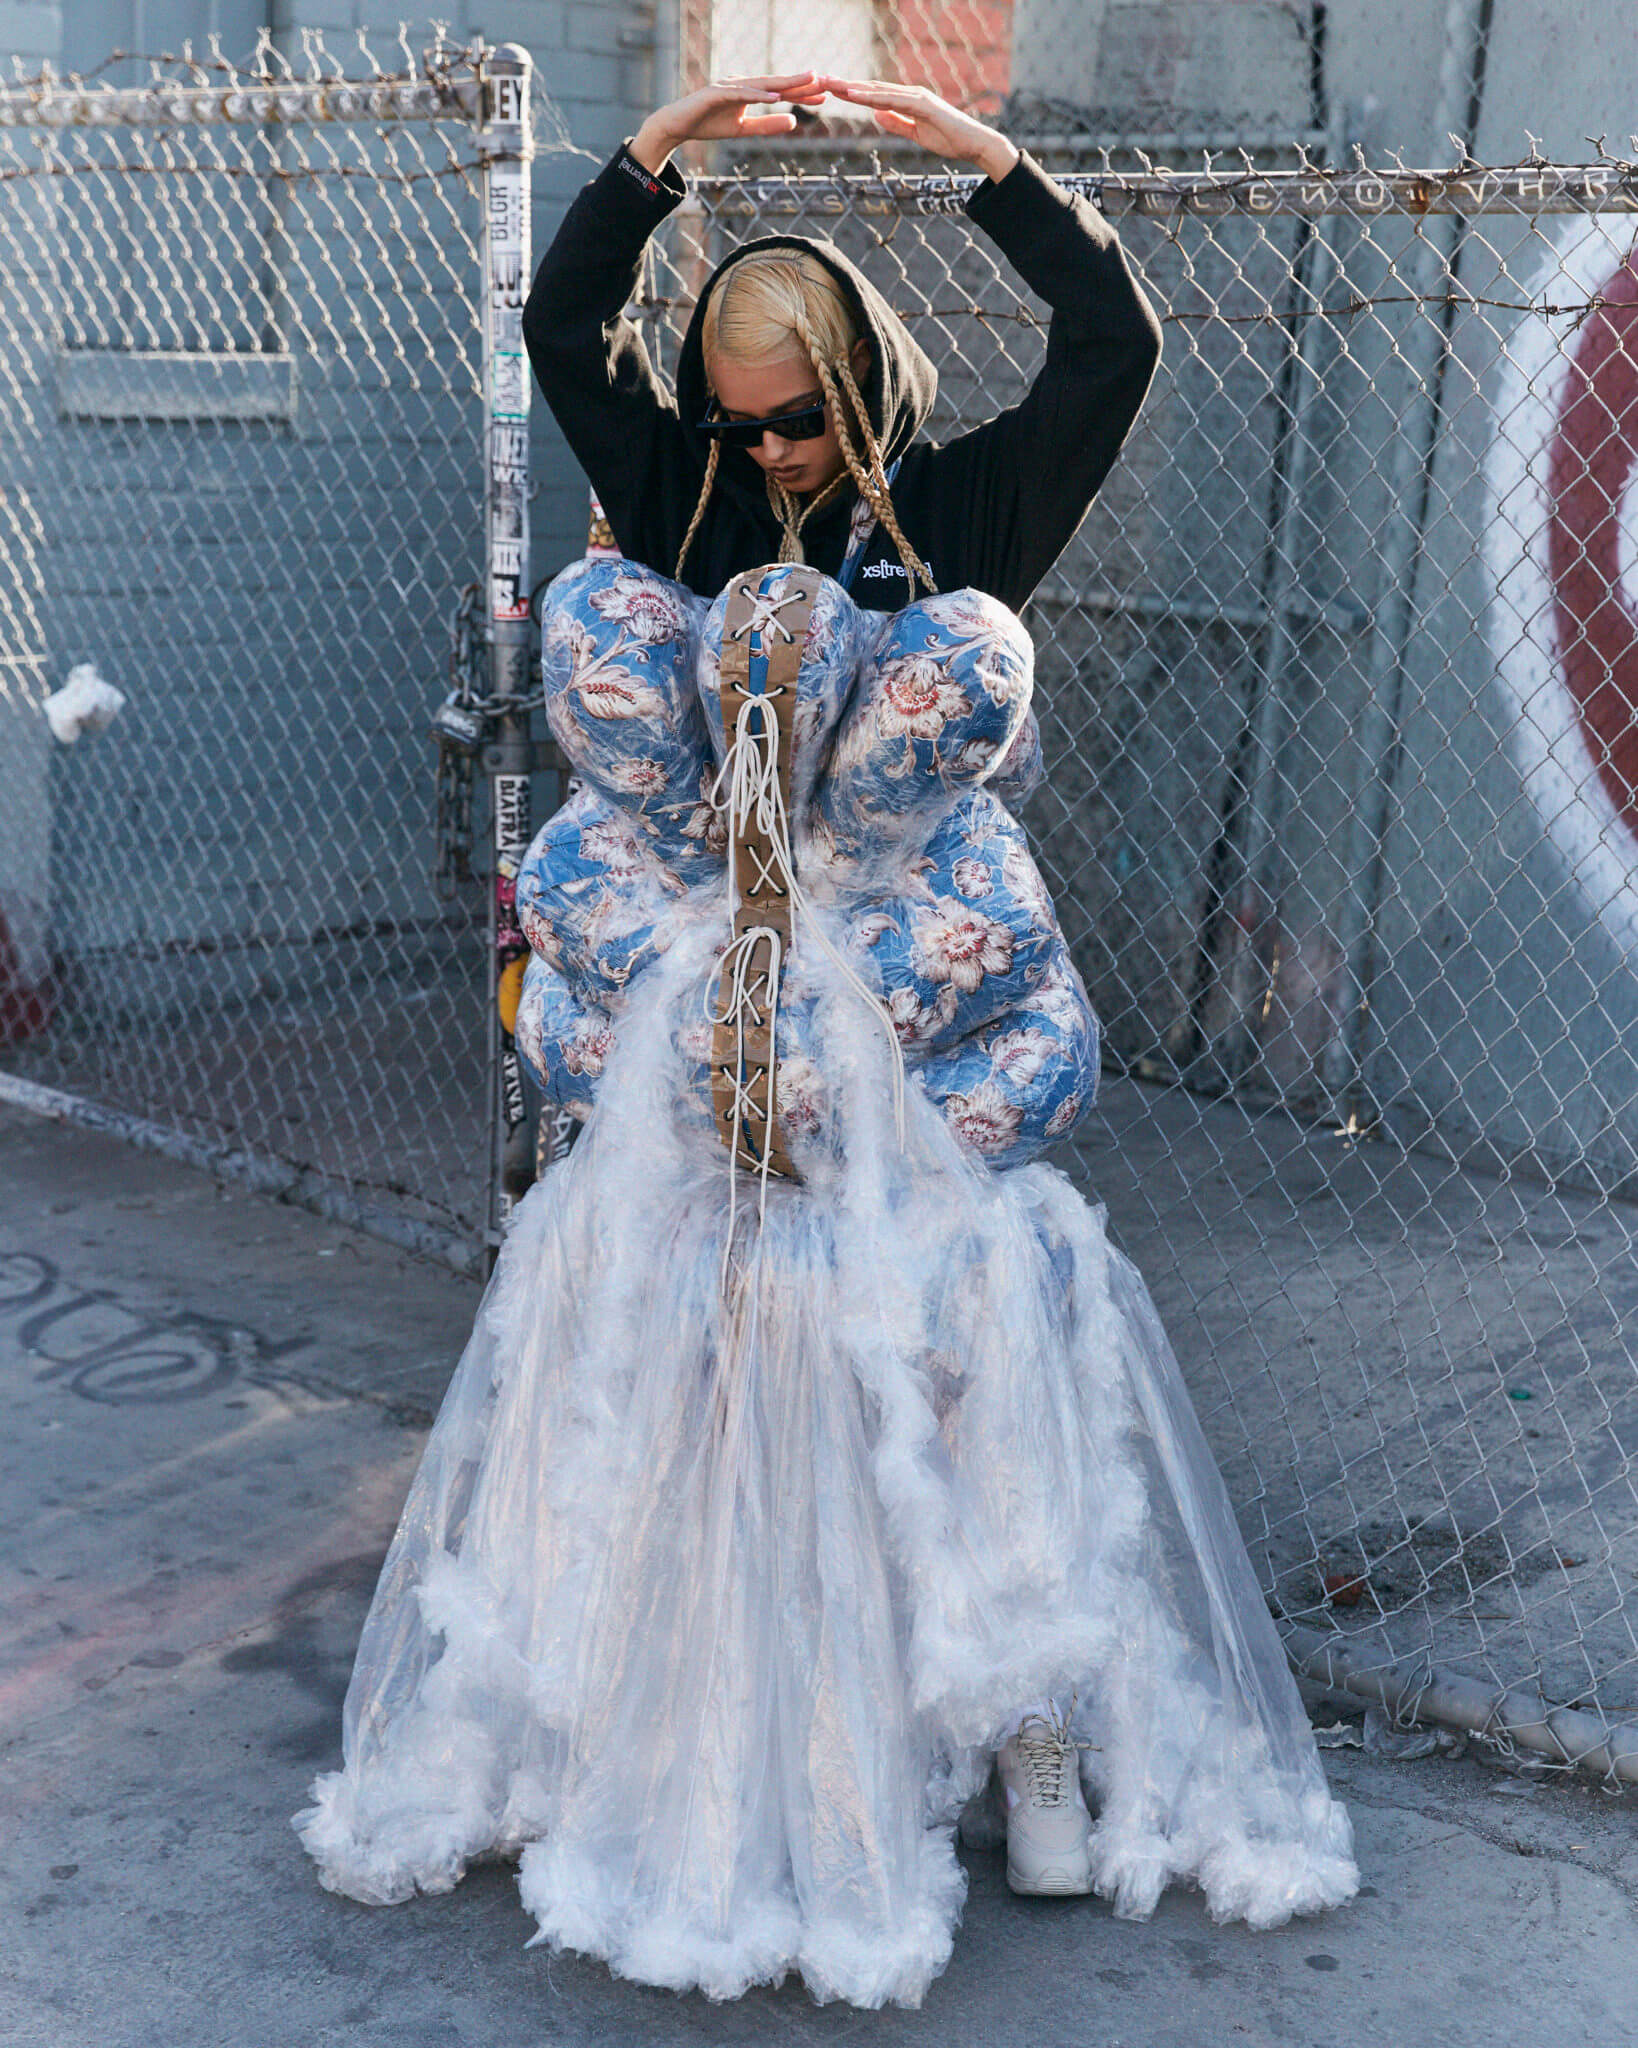 Hoodie: XStreme, Dress: Marry Me Jimmy Paul, Sunglasses: Céline